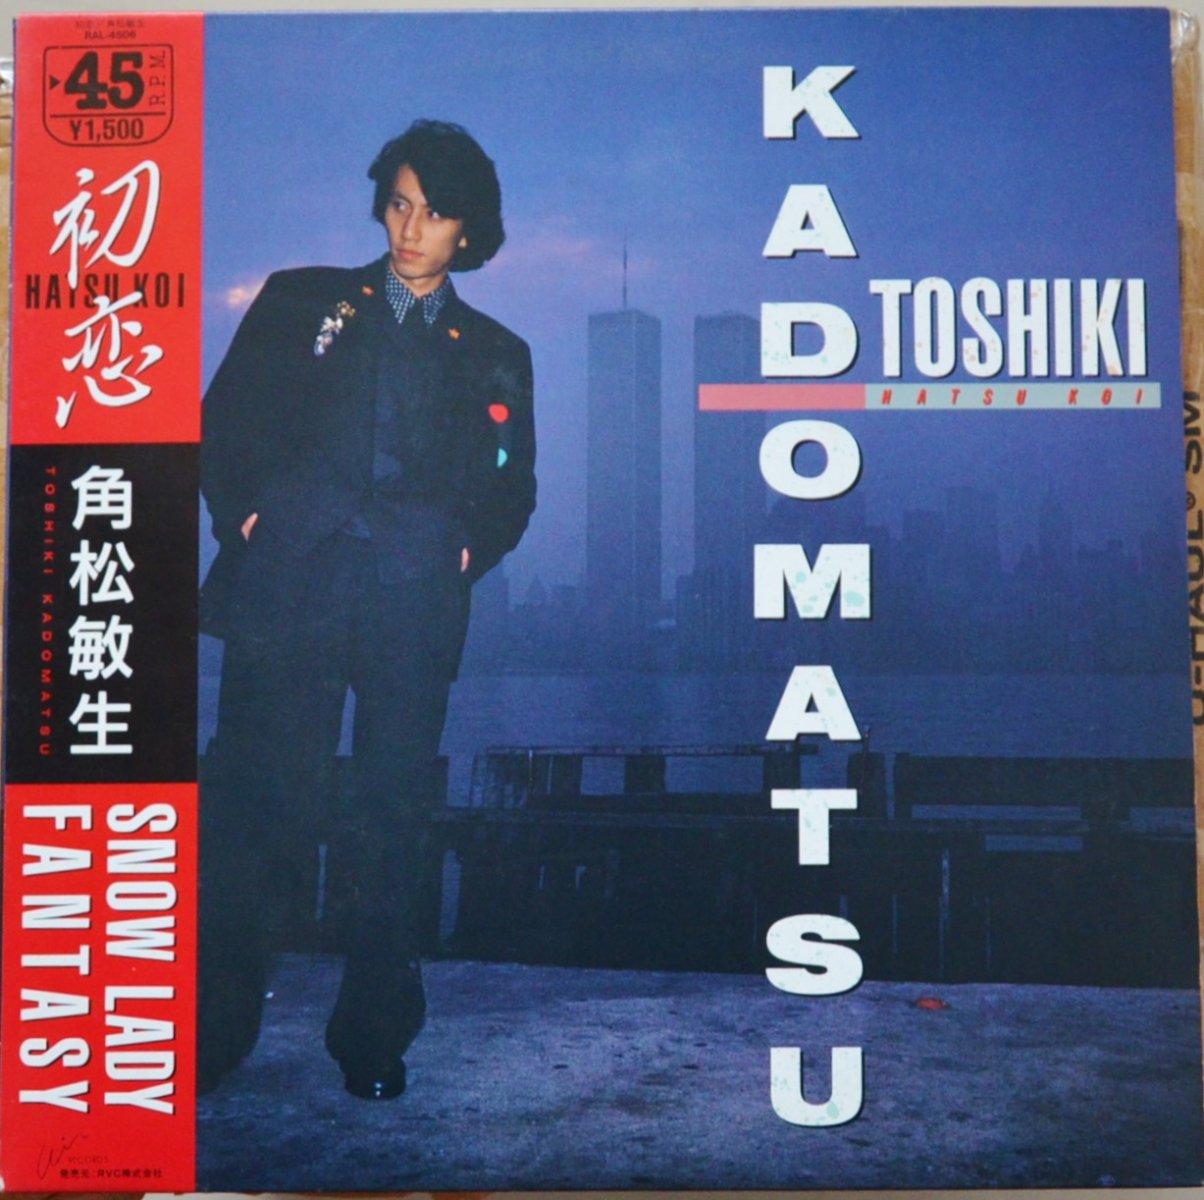 角松敏生 TOSHIKI KADOMATSU / 初恋 / SNOW LADY FANTASY (12